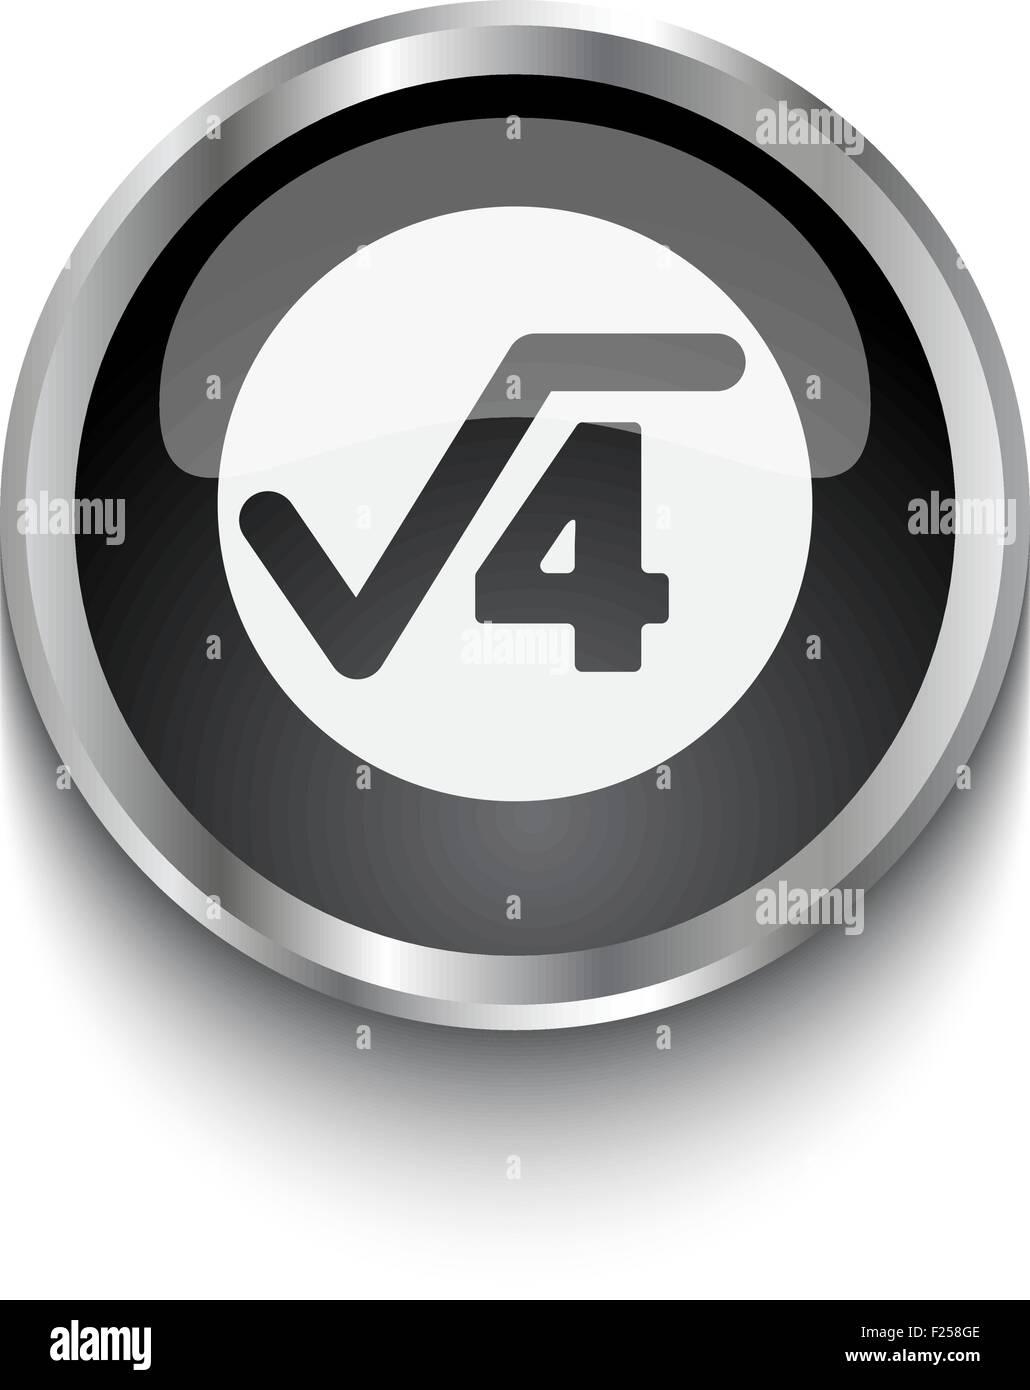 White square root symbol on black web button stock vector art white square root symbol on black web button buycottarizona Images